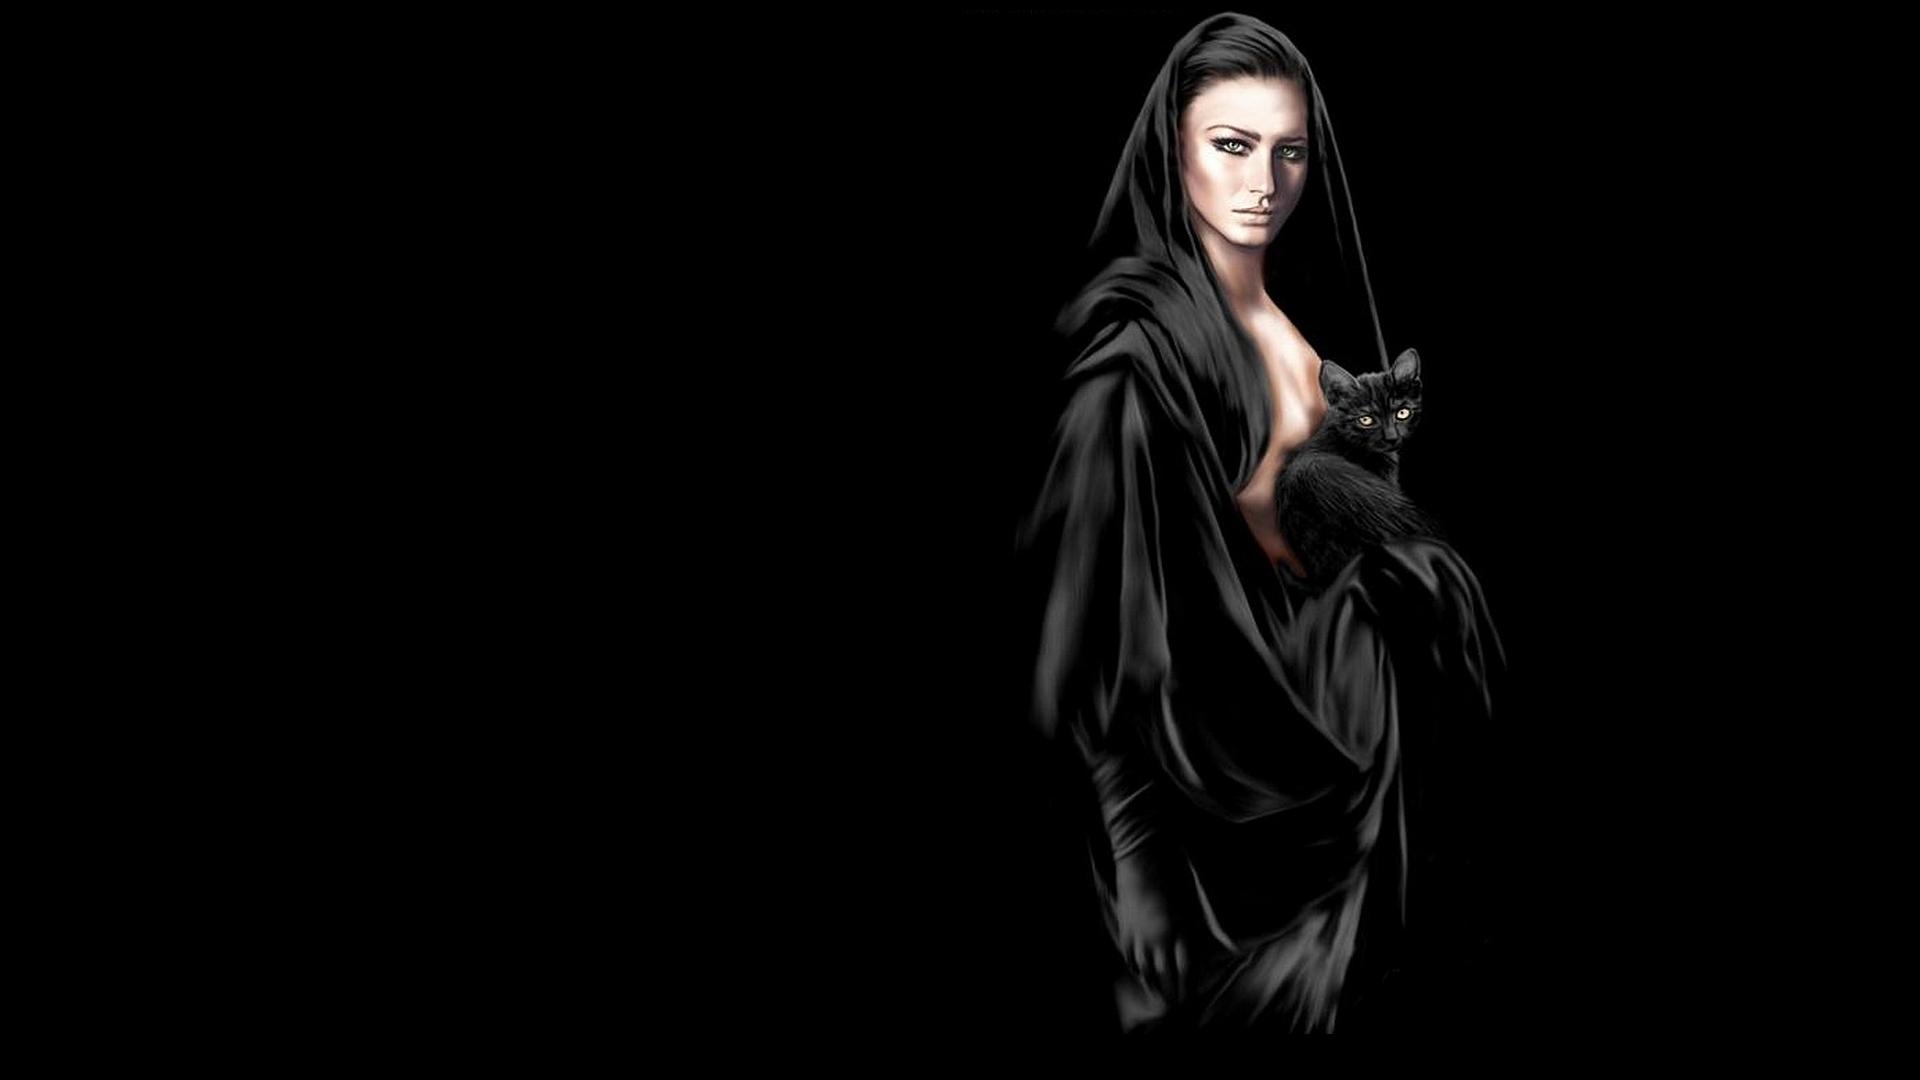 Women Black Wallpaper 1920x1080 Women Black Hooded Cats Drawn 1920x1080